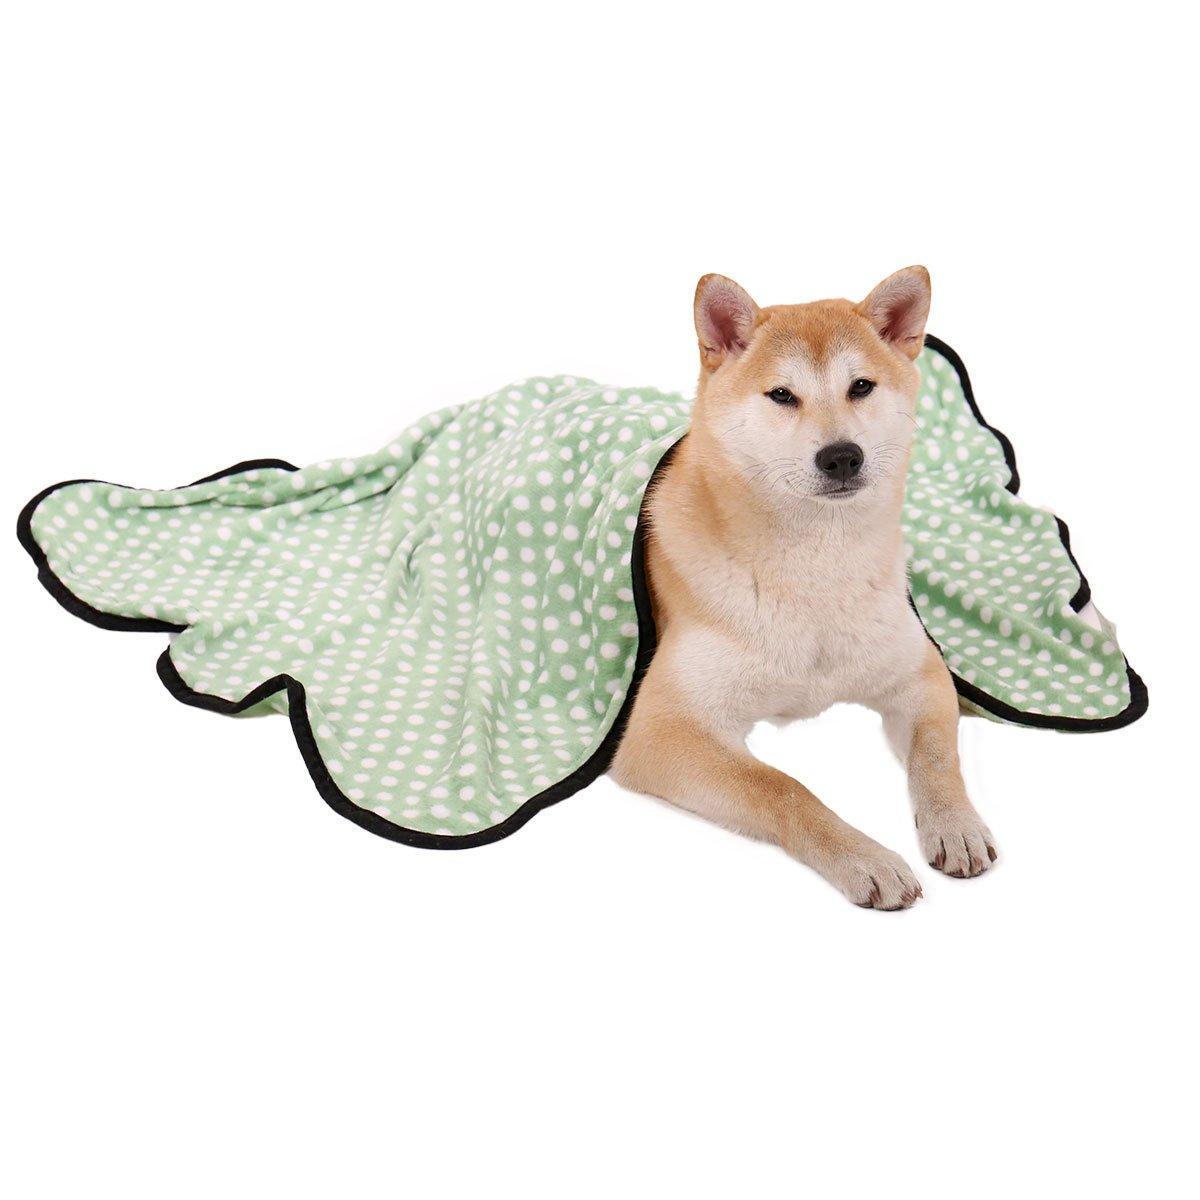 Dog Cat Velvet Blanket ,Speedy Pet Puppy Cushion Soft Warm Sleep Mat Blankets for All Kinds of Small Medium Large Animals Green M